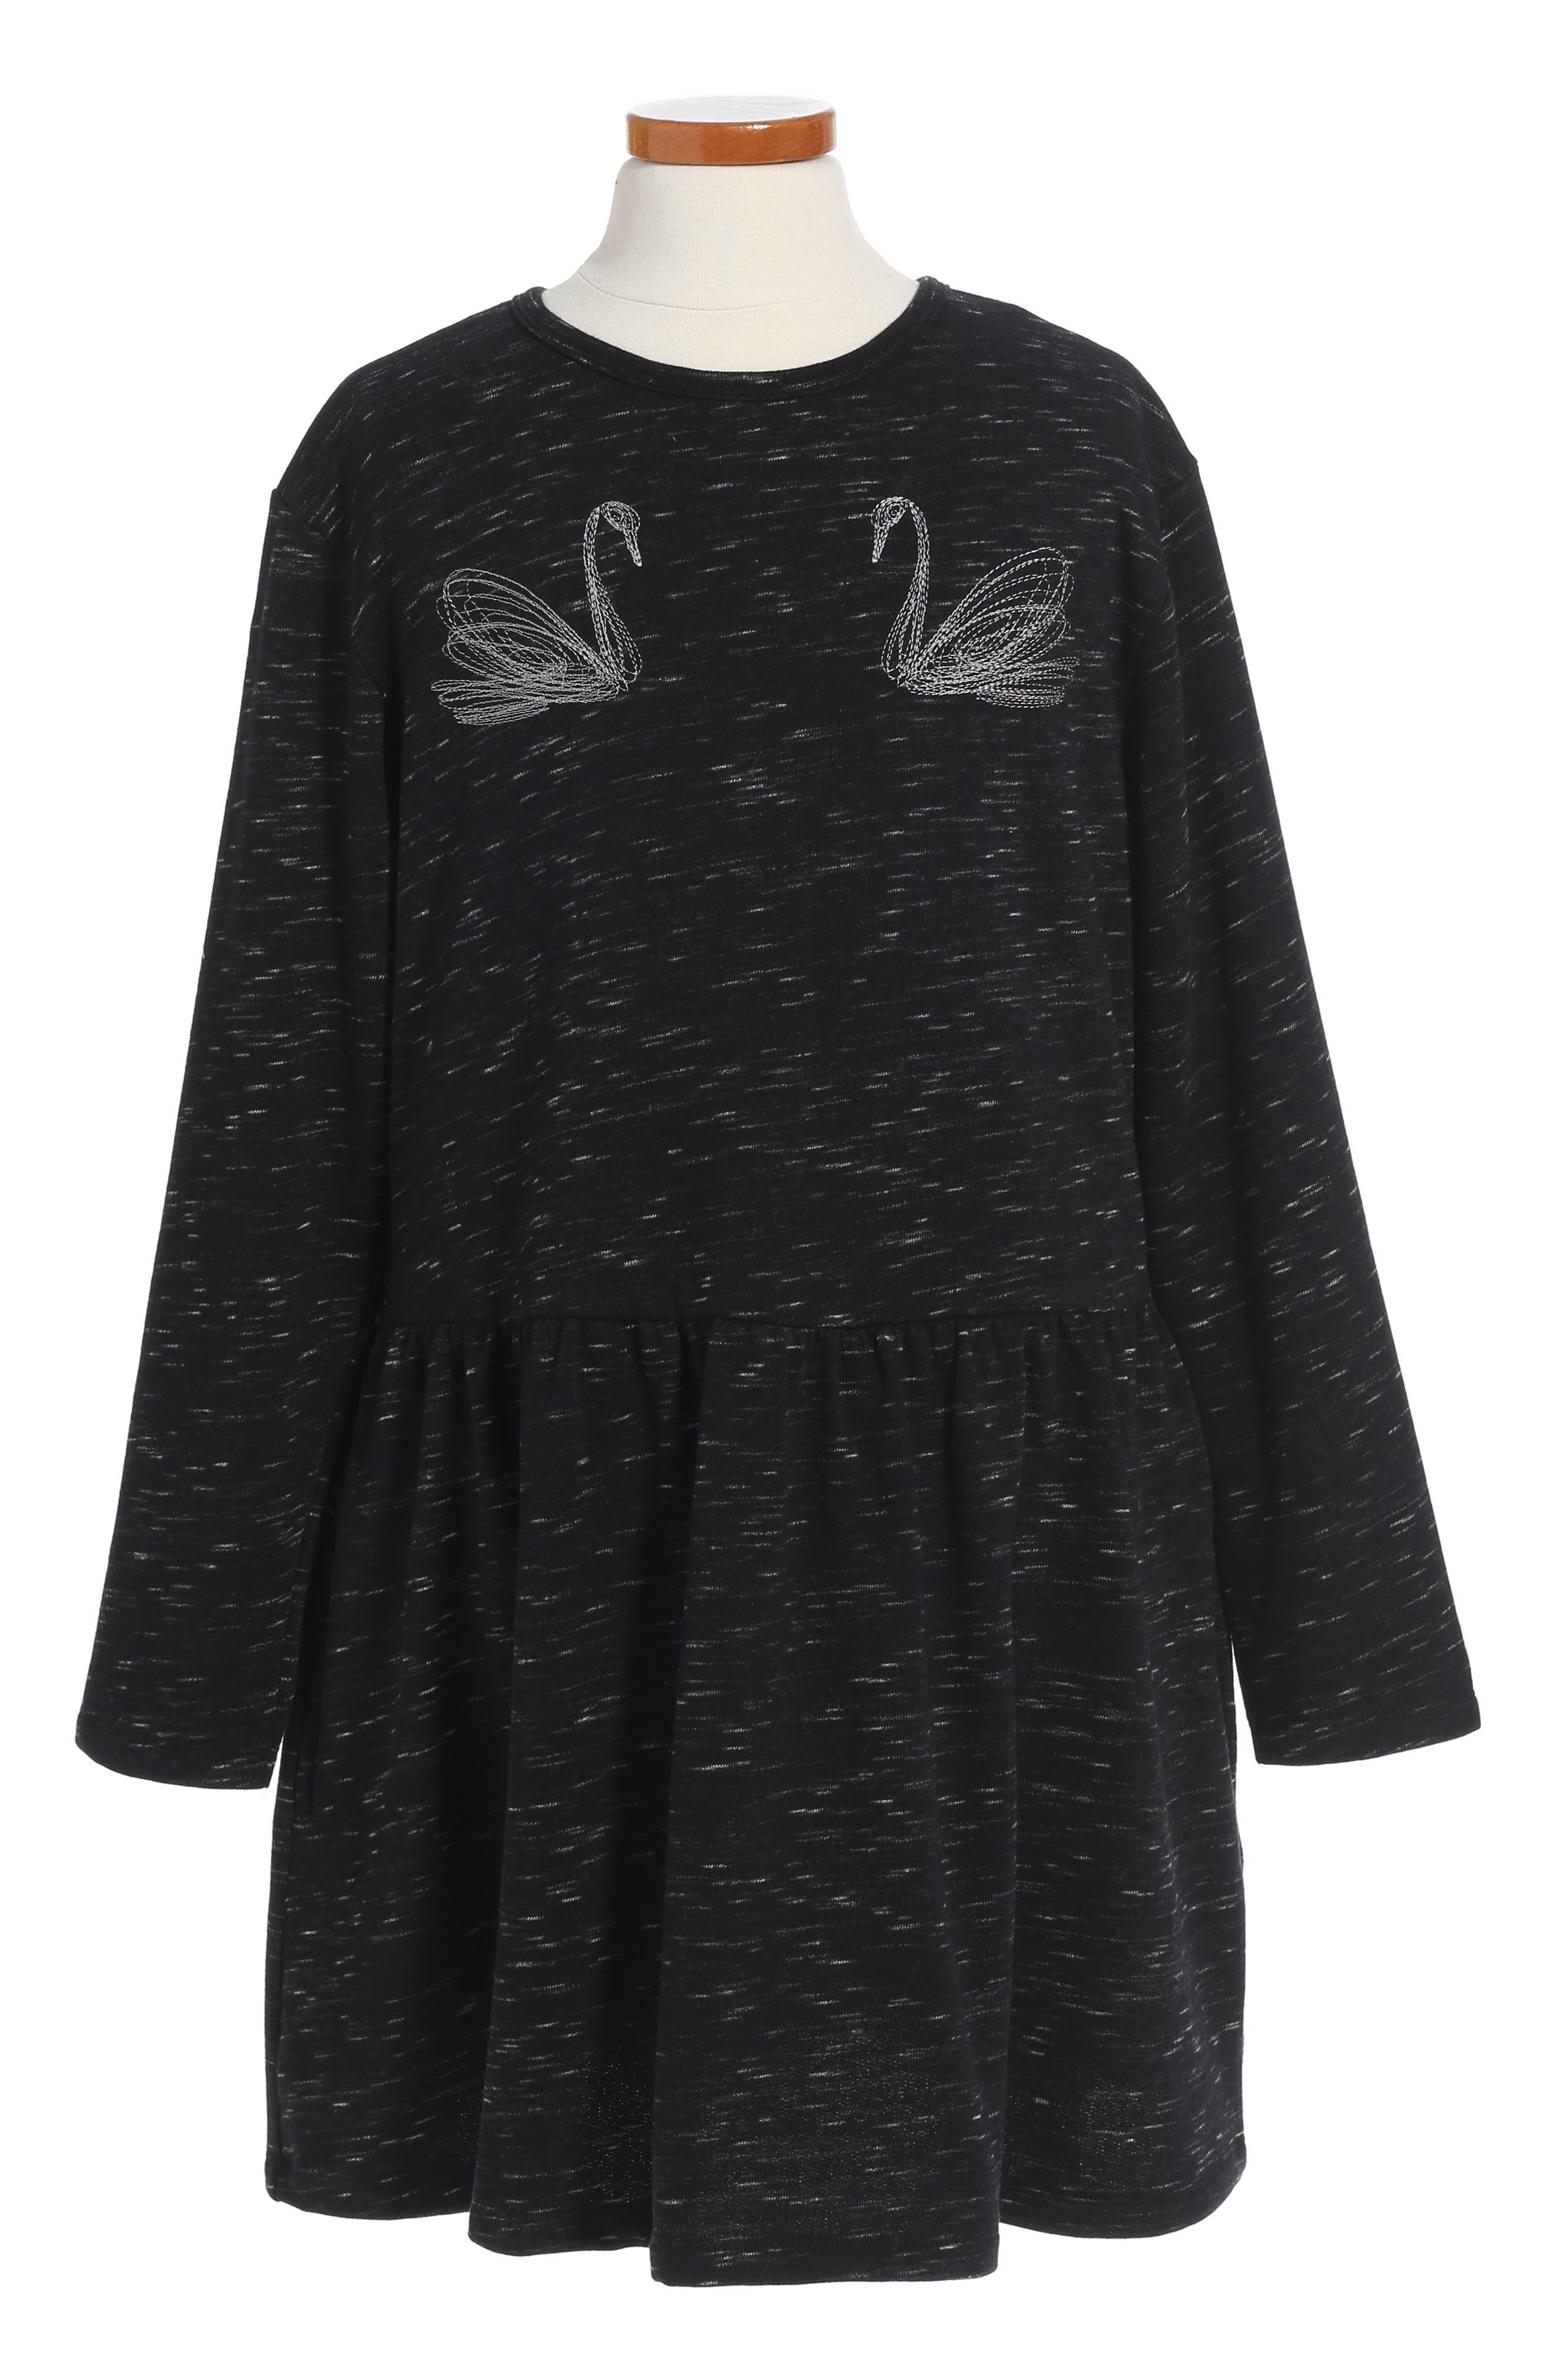 Alternate Image 1 Selected - Stella McCartney Kids Marion Embroidered Dress (Toddler Girls, Little Girls & Big Girls)